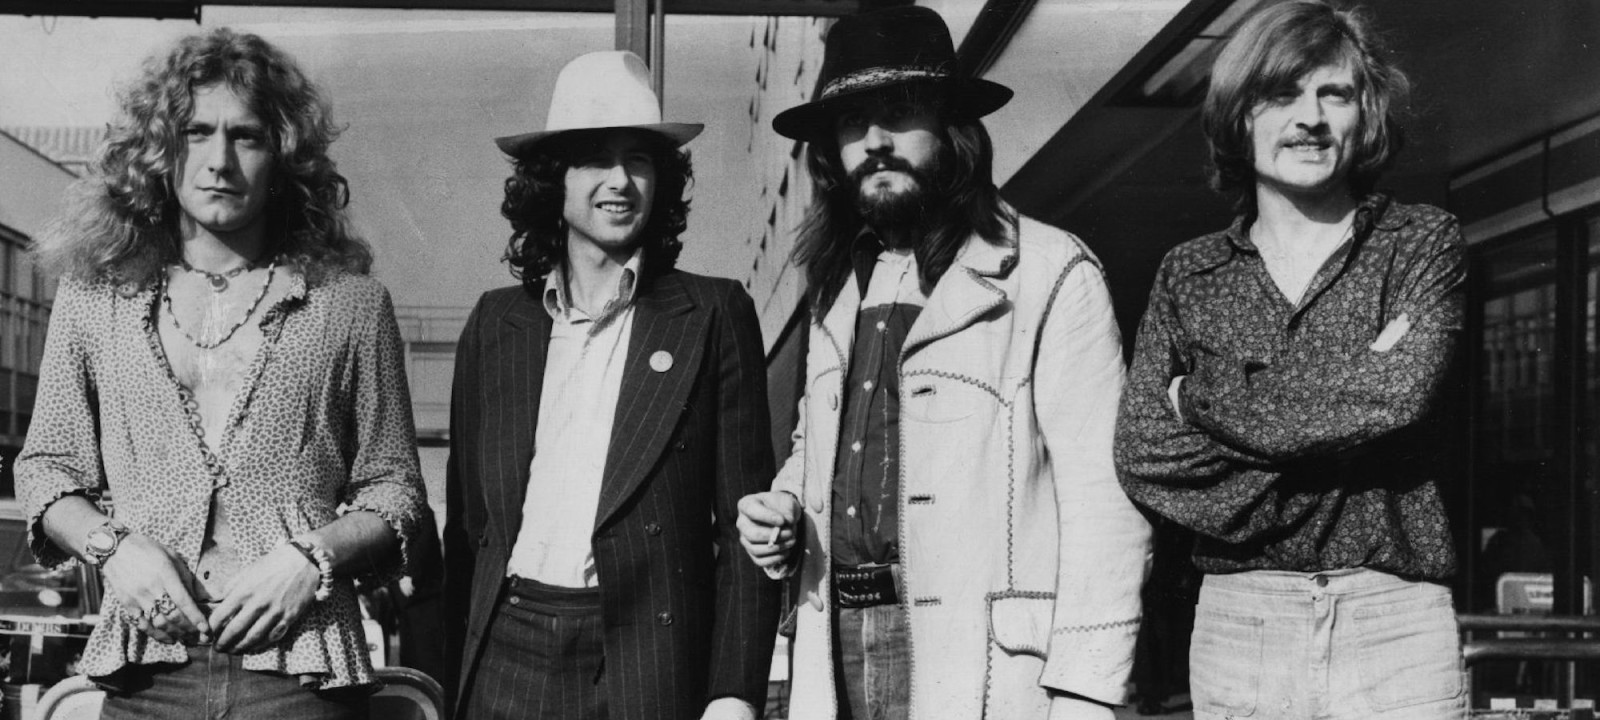 June 1973:  British rock band Led Zeppelin. From left to right, Robert Plant, Jimmy Page, John Bonham (1947 – 1980), John Paul Jones.